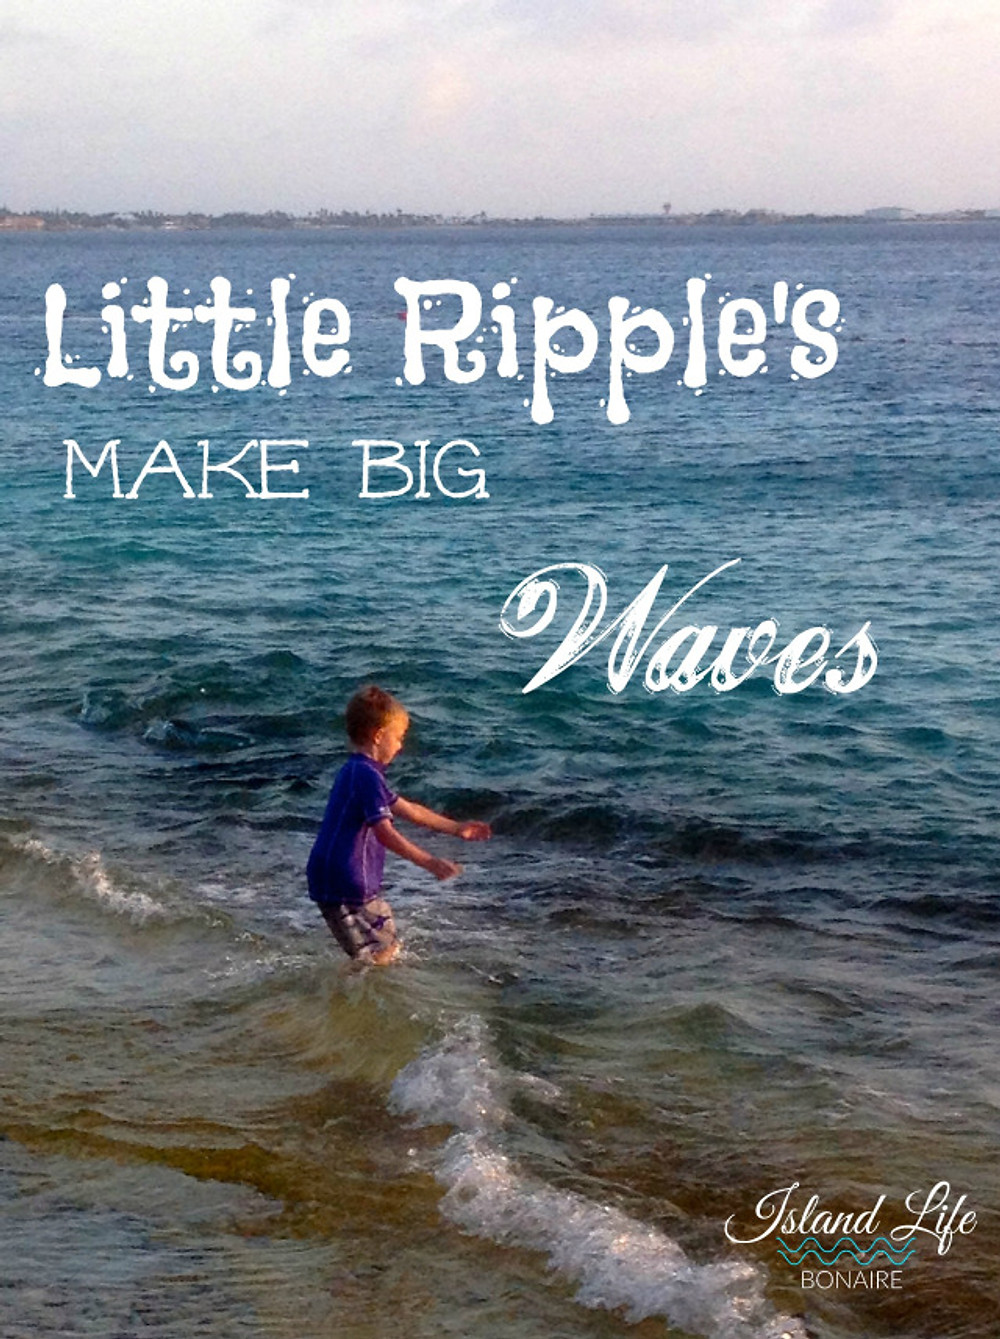 Little Ripple's make big waves.